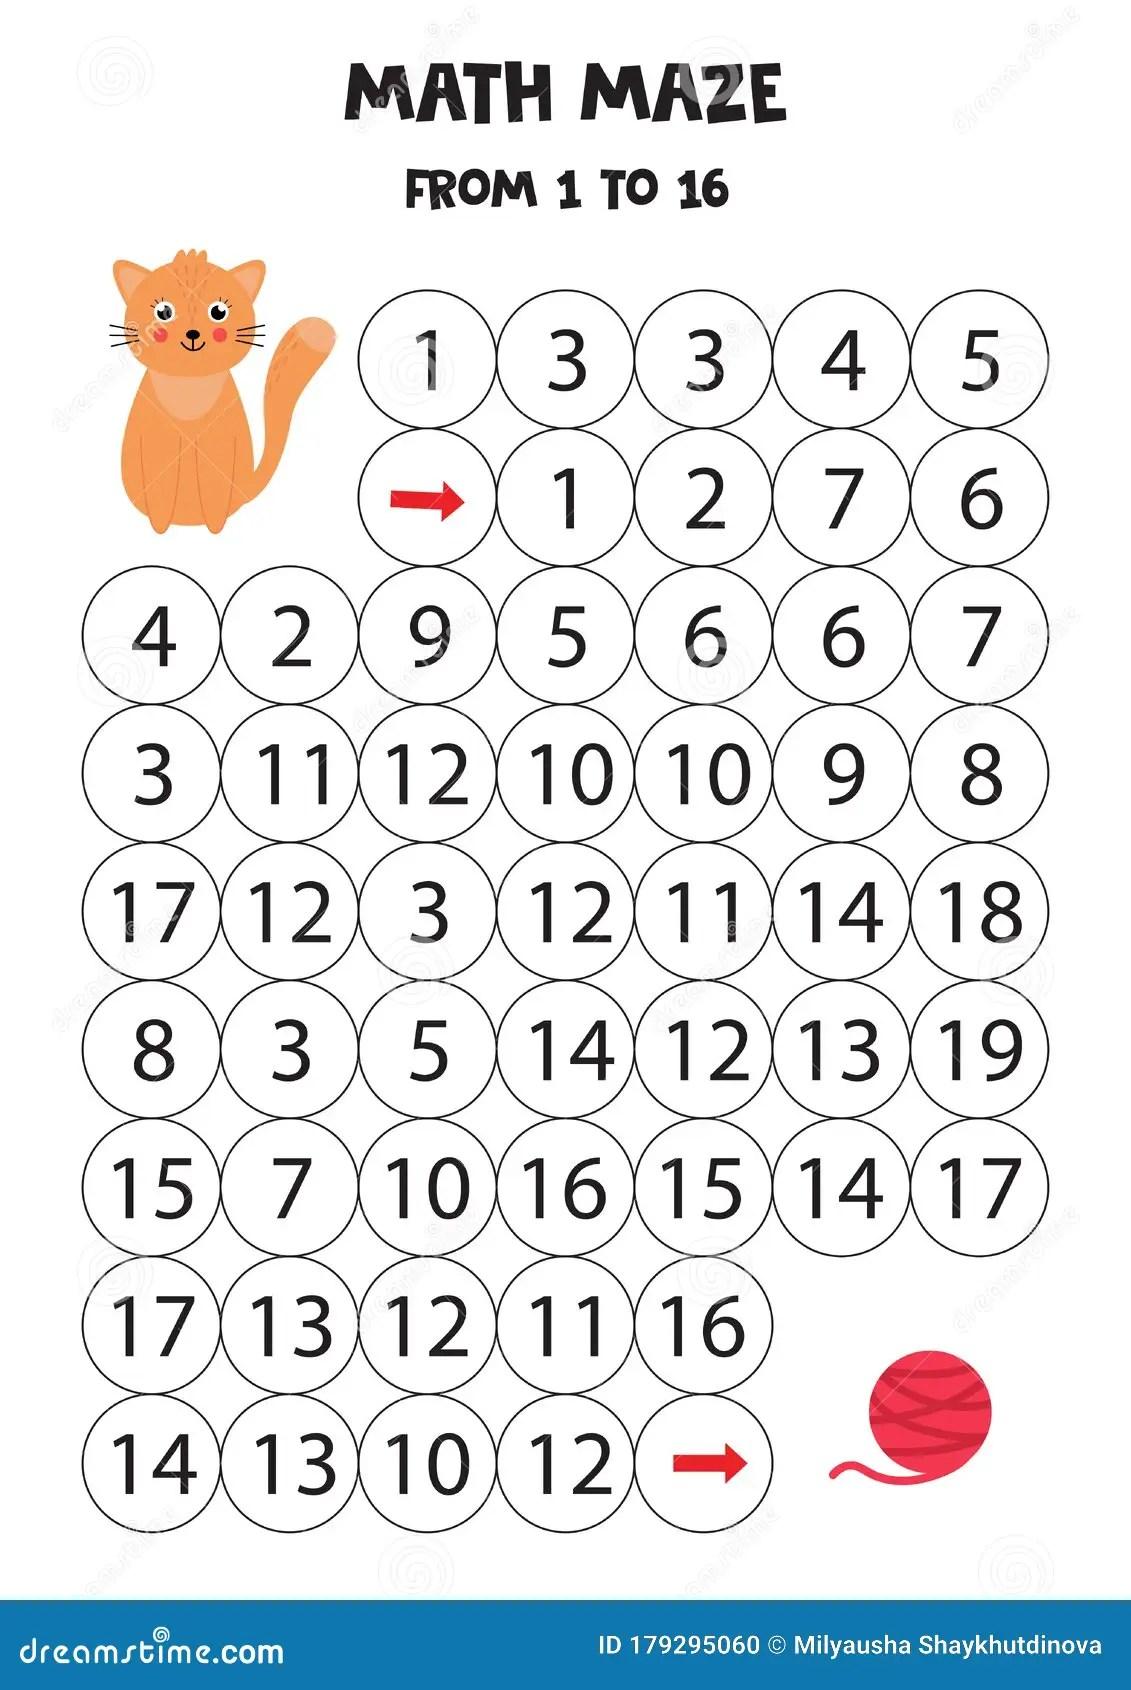 Mathematical Maze For Kids Cute Cartoon Cat And Ball Of